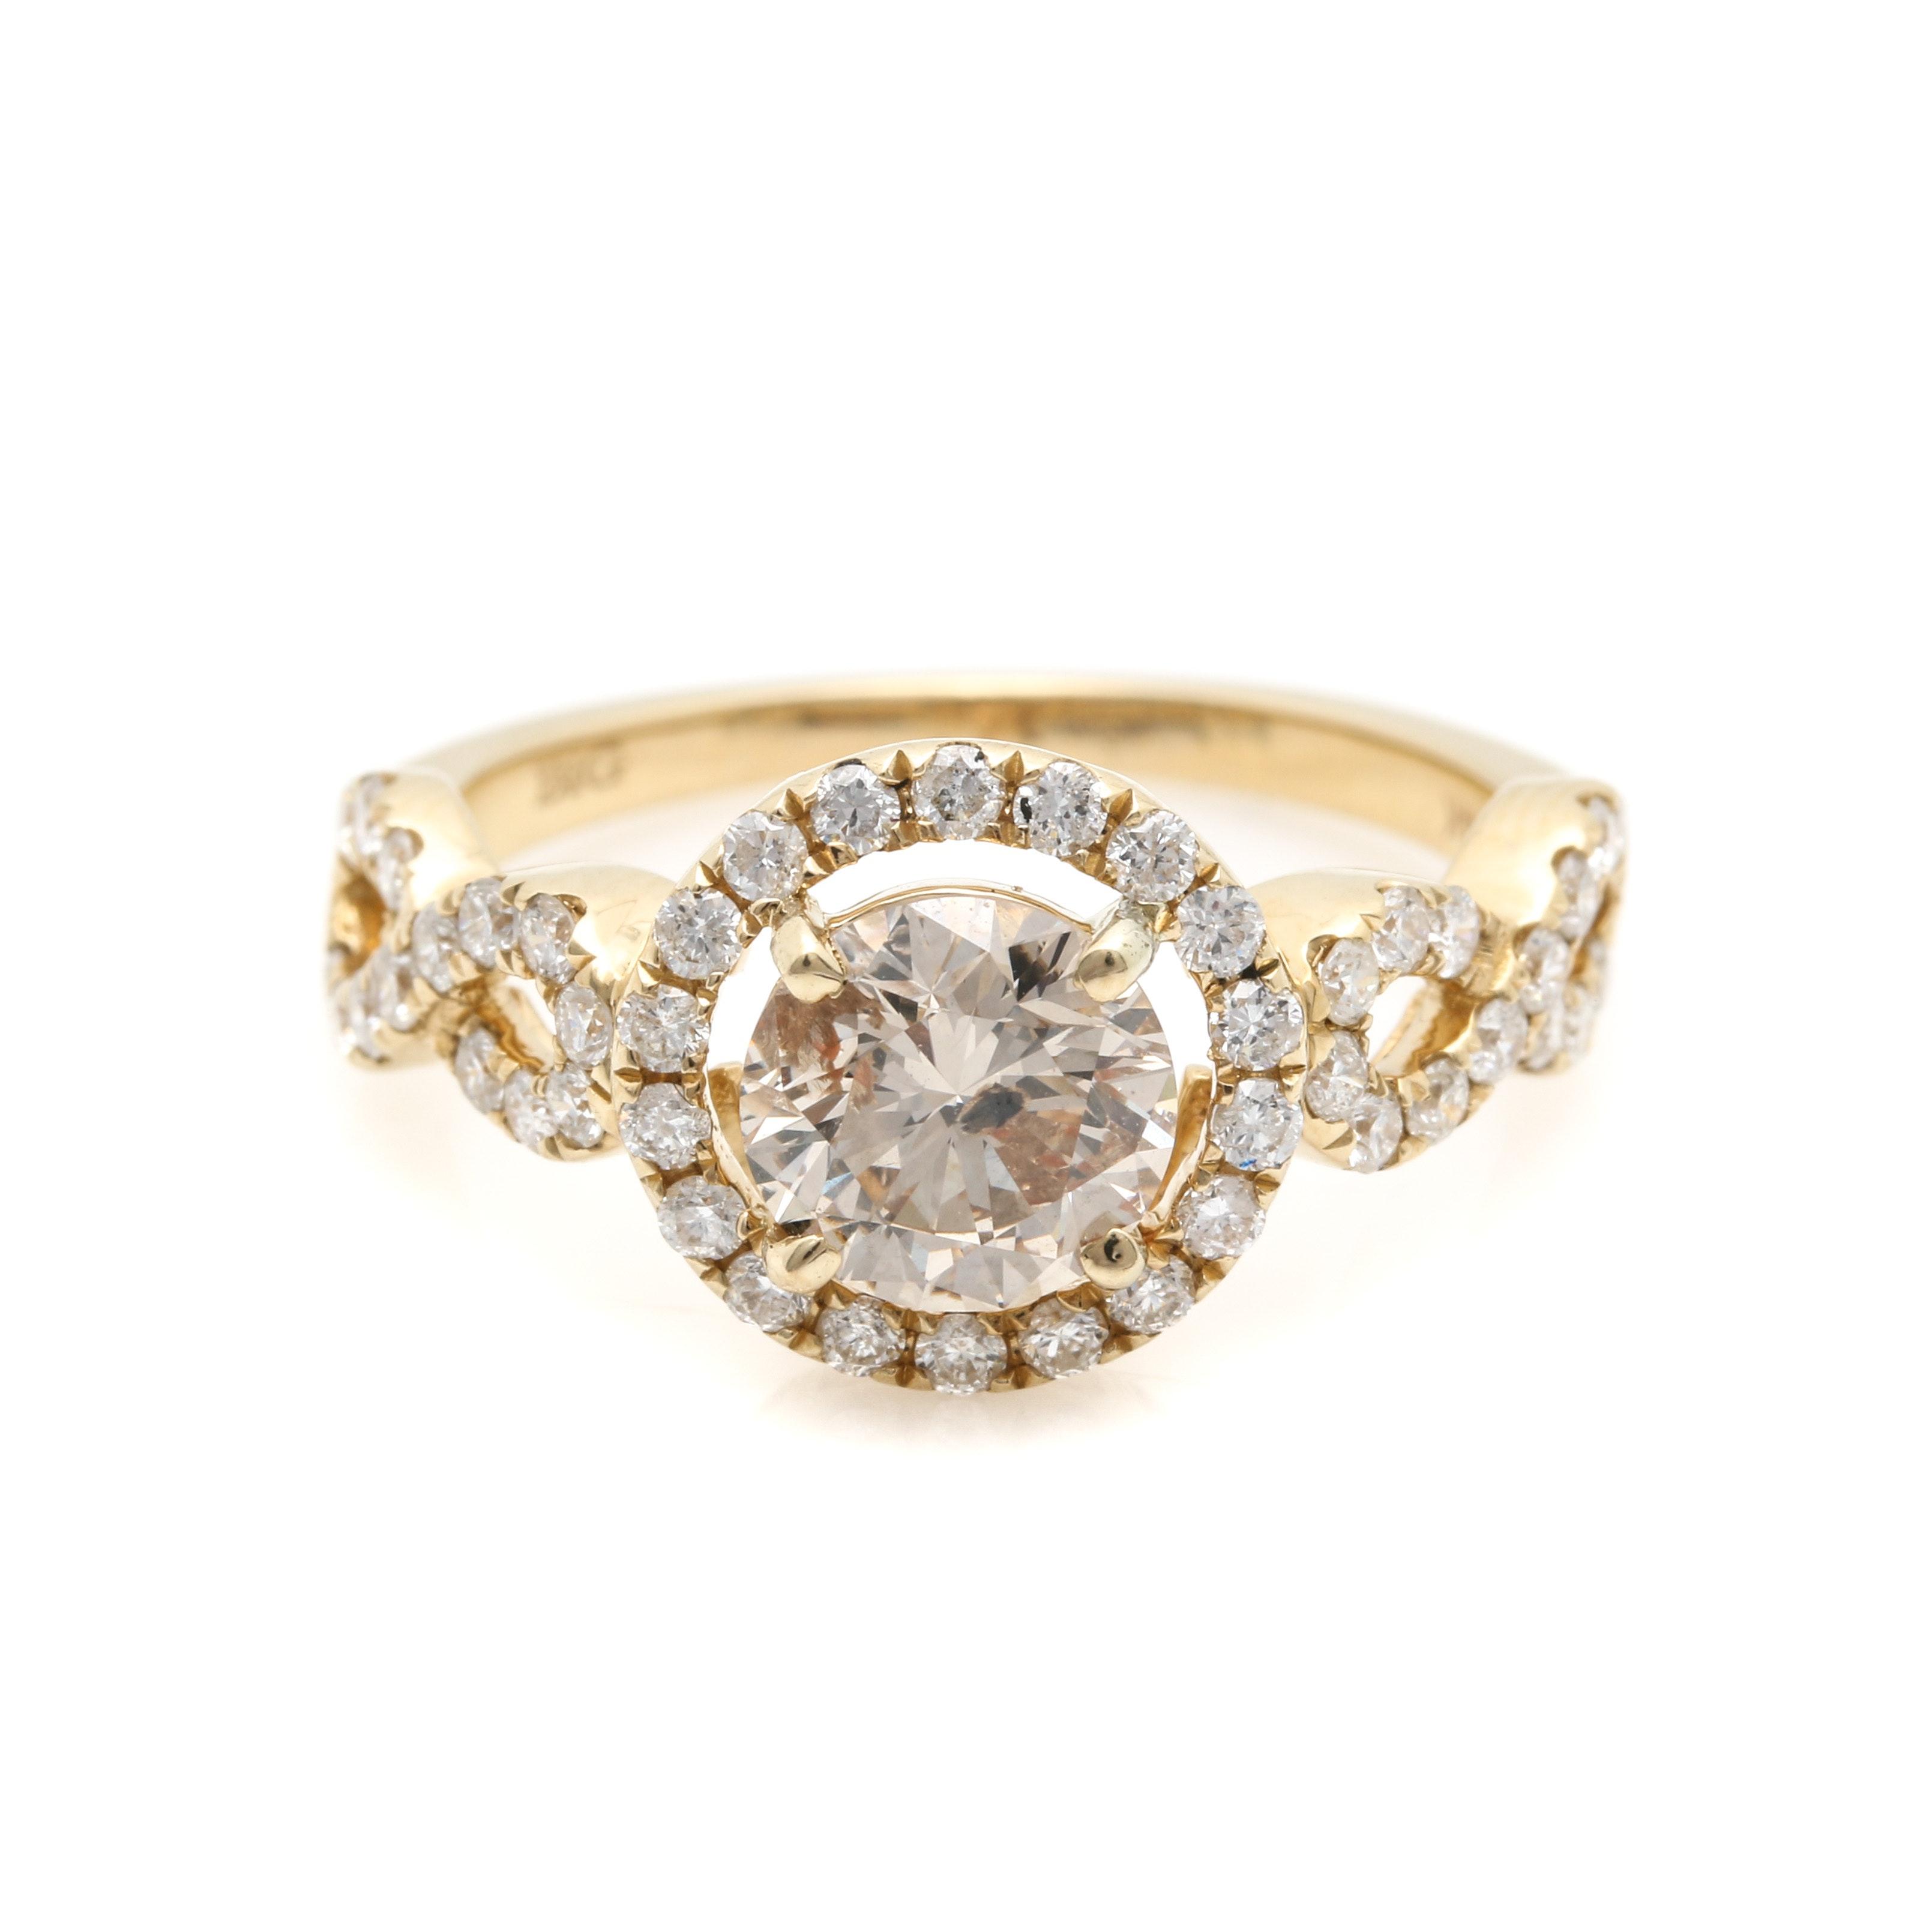 14K Yellow Gold 1.70 CTW Diamond Halo Ring